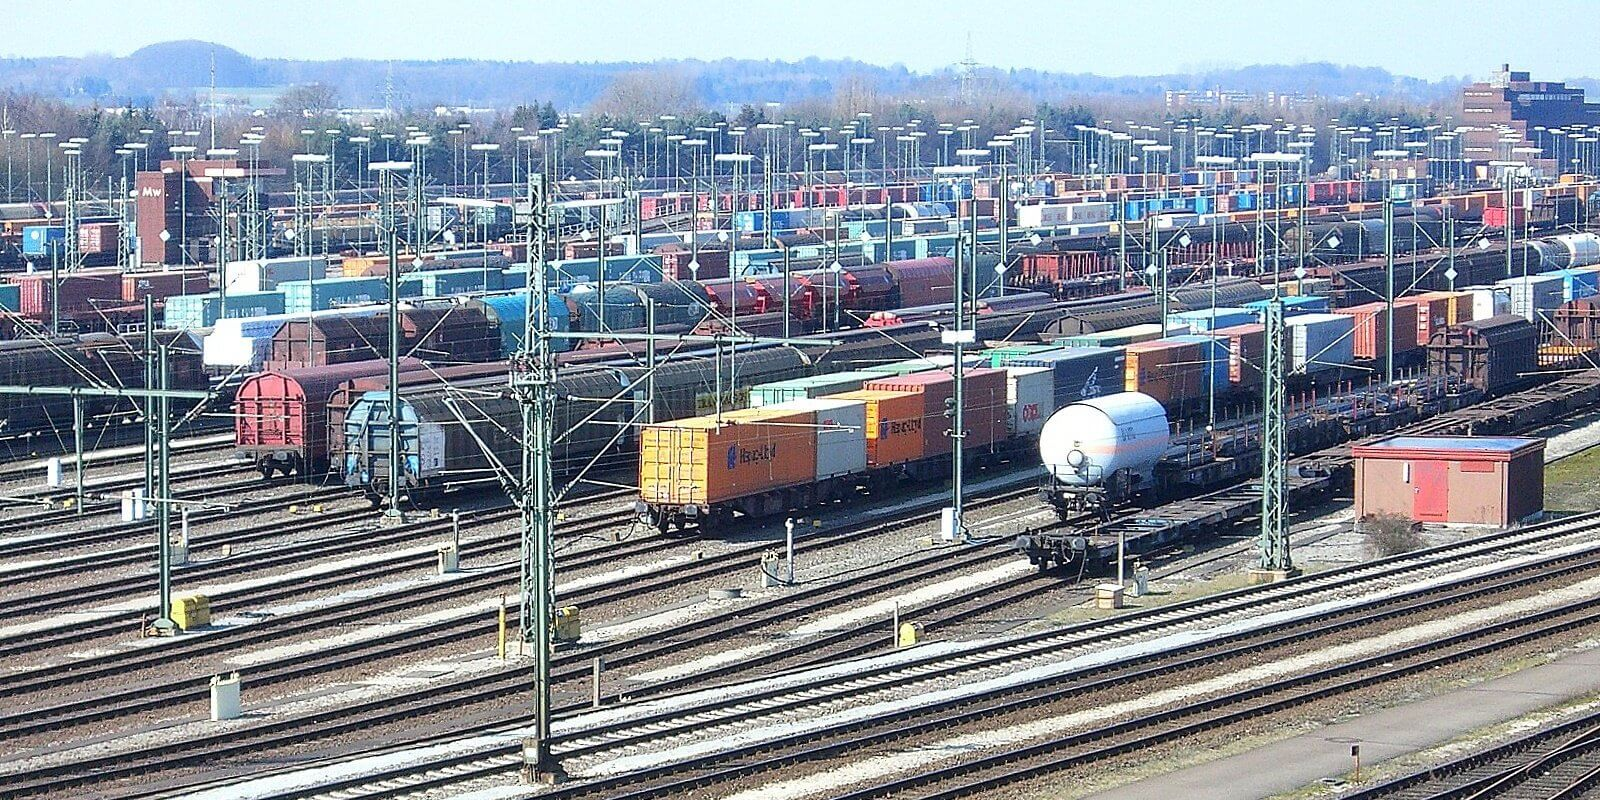 Rangierbahnhof-Maschen-Wikipedia4